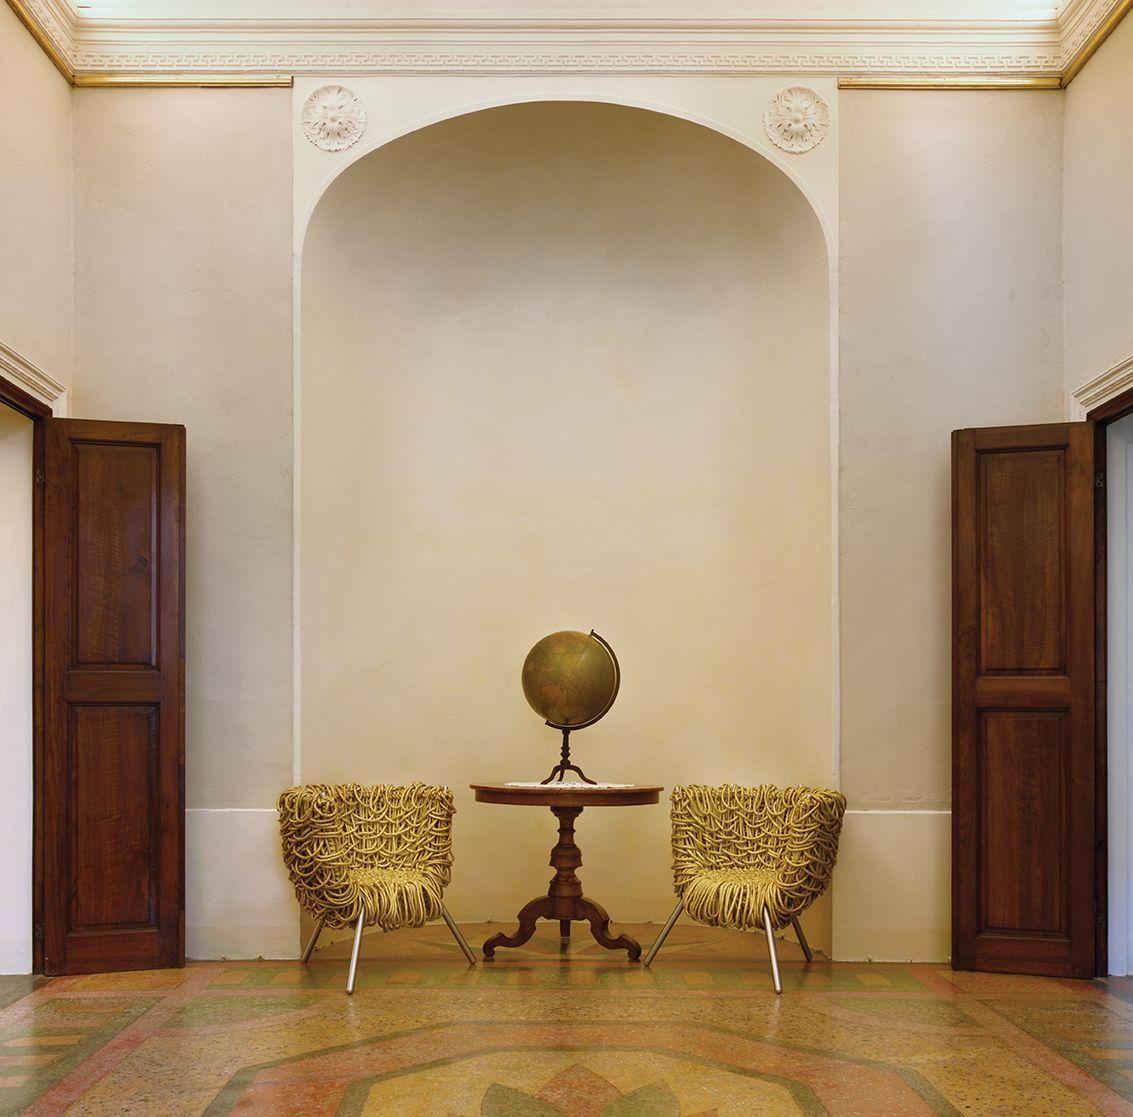 Appartamento San Martino - image 6